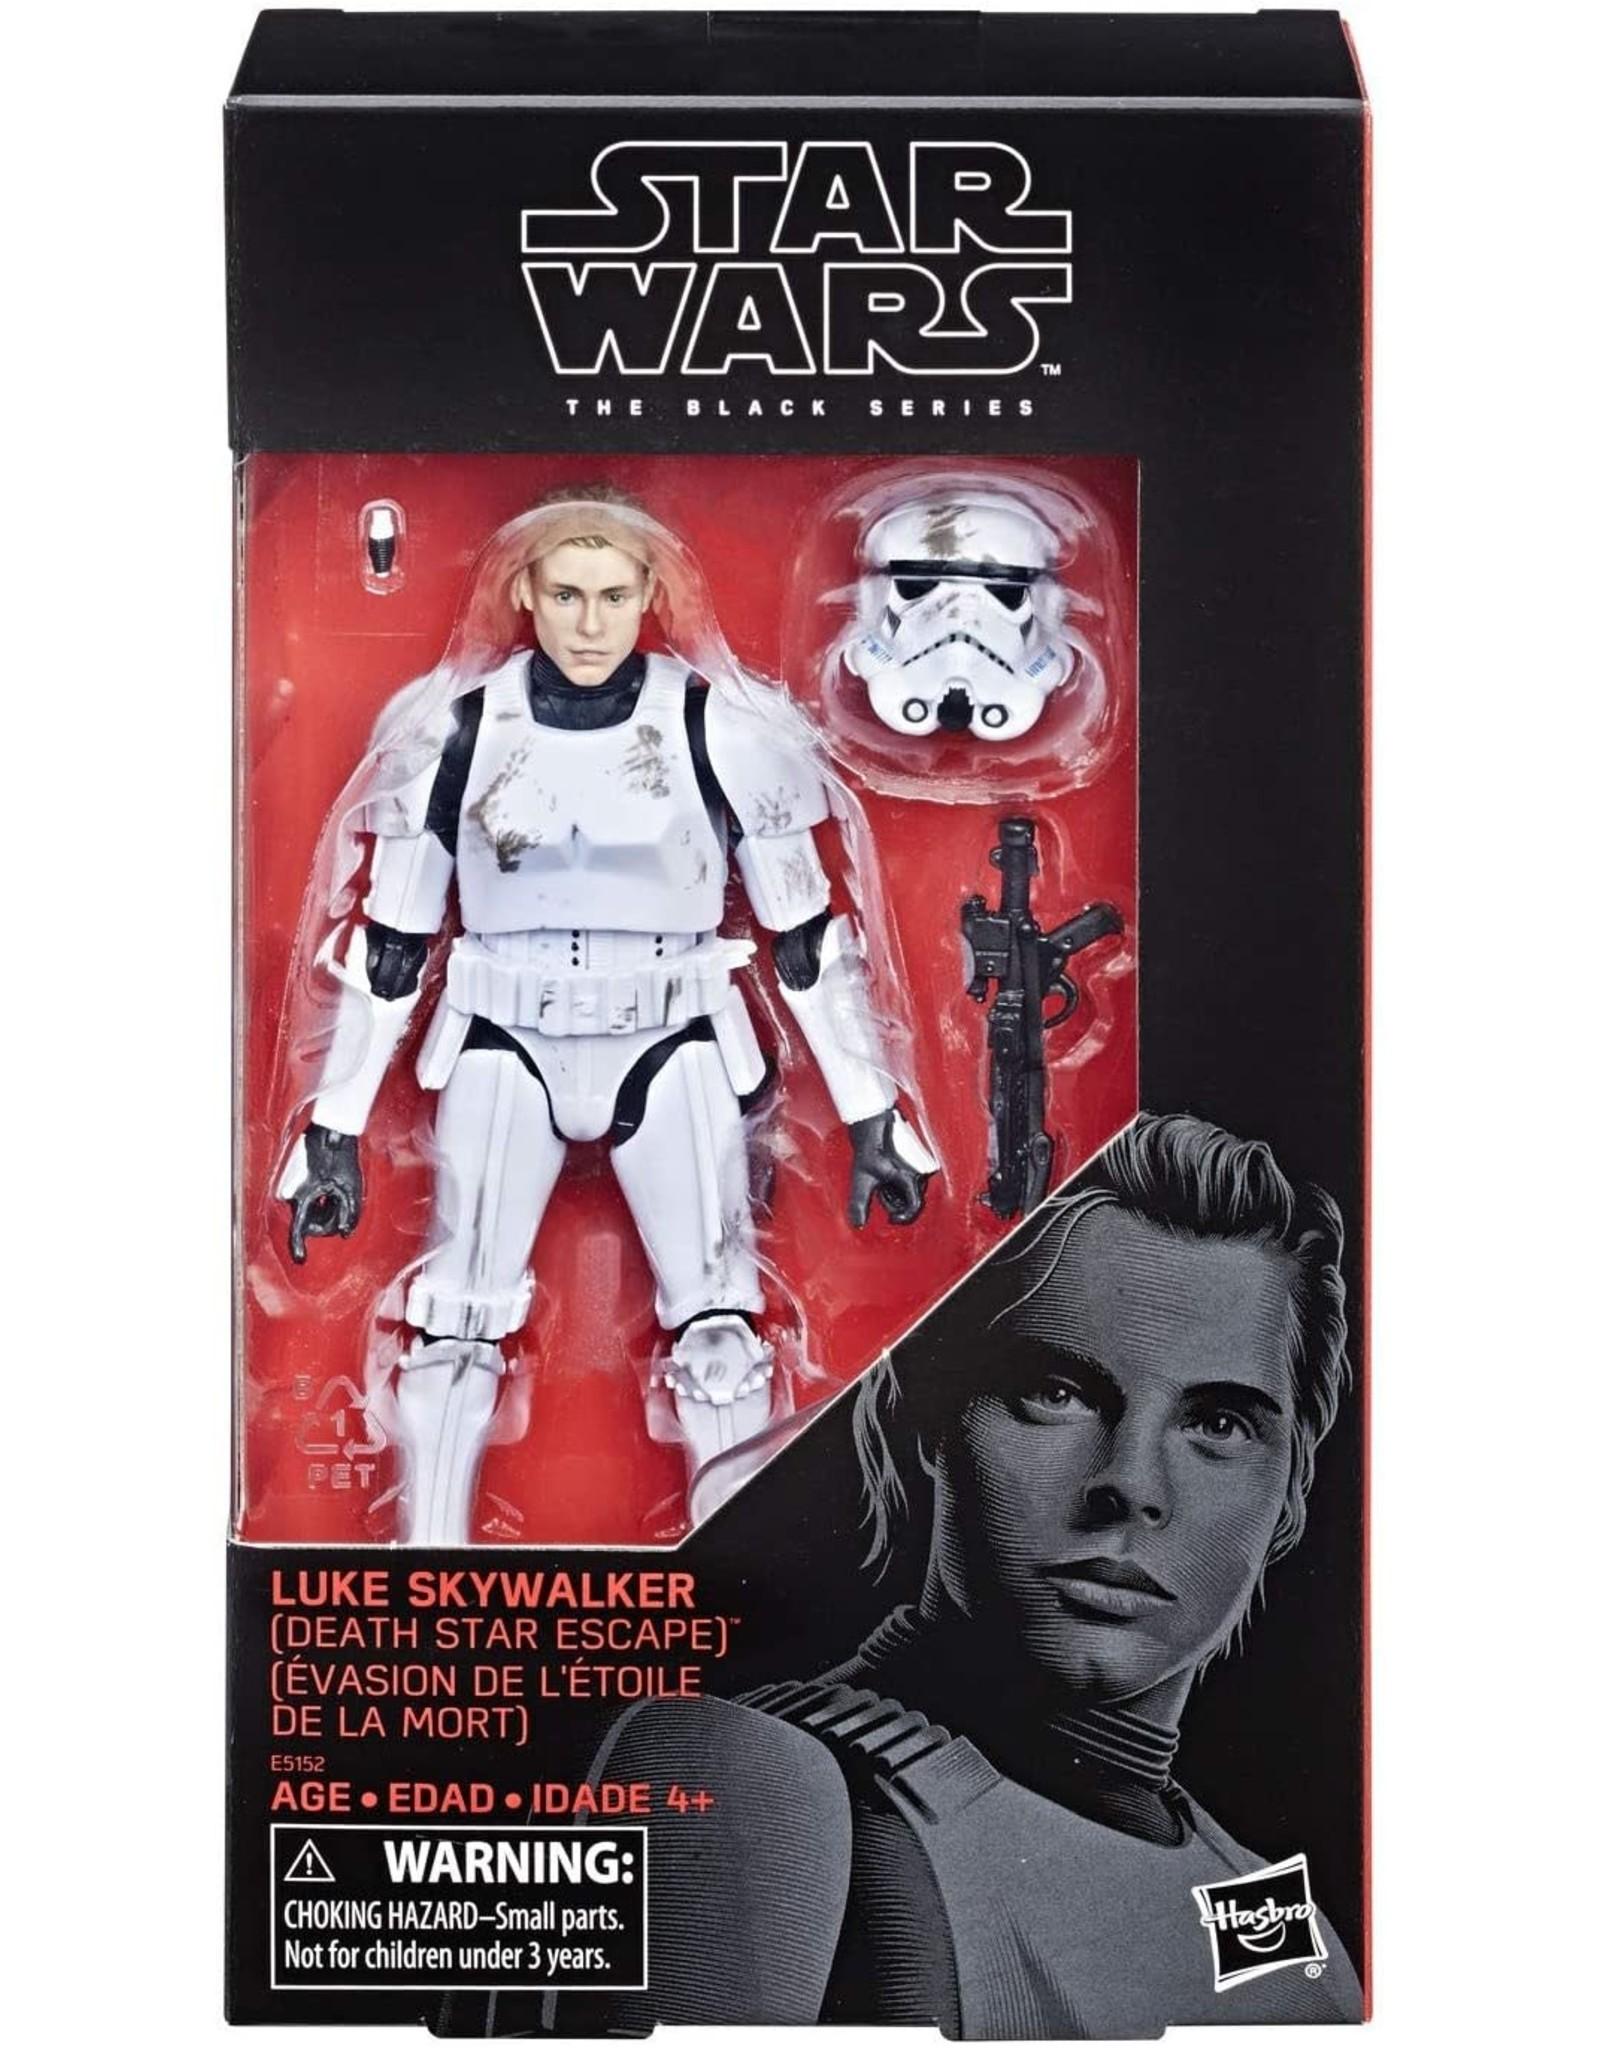 Hasbro Star Wars The Black Series Luke Skywalker (Death Star Escape)